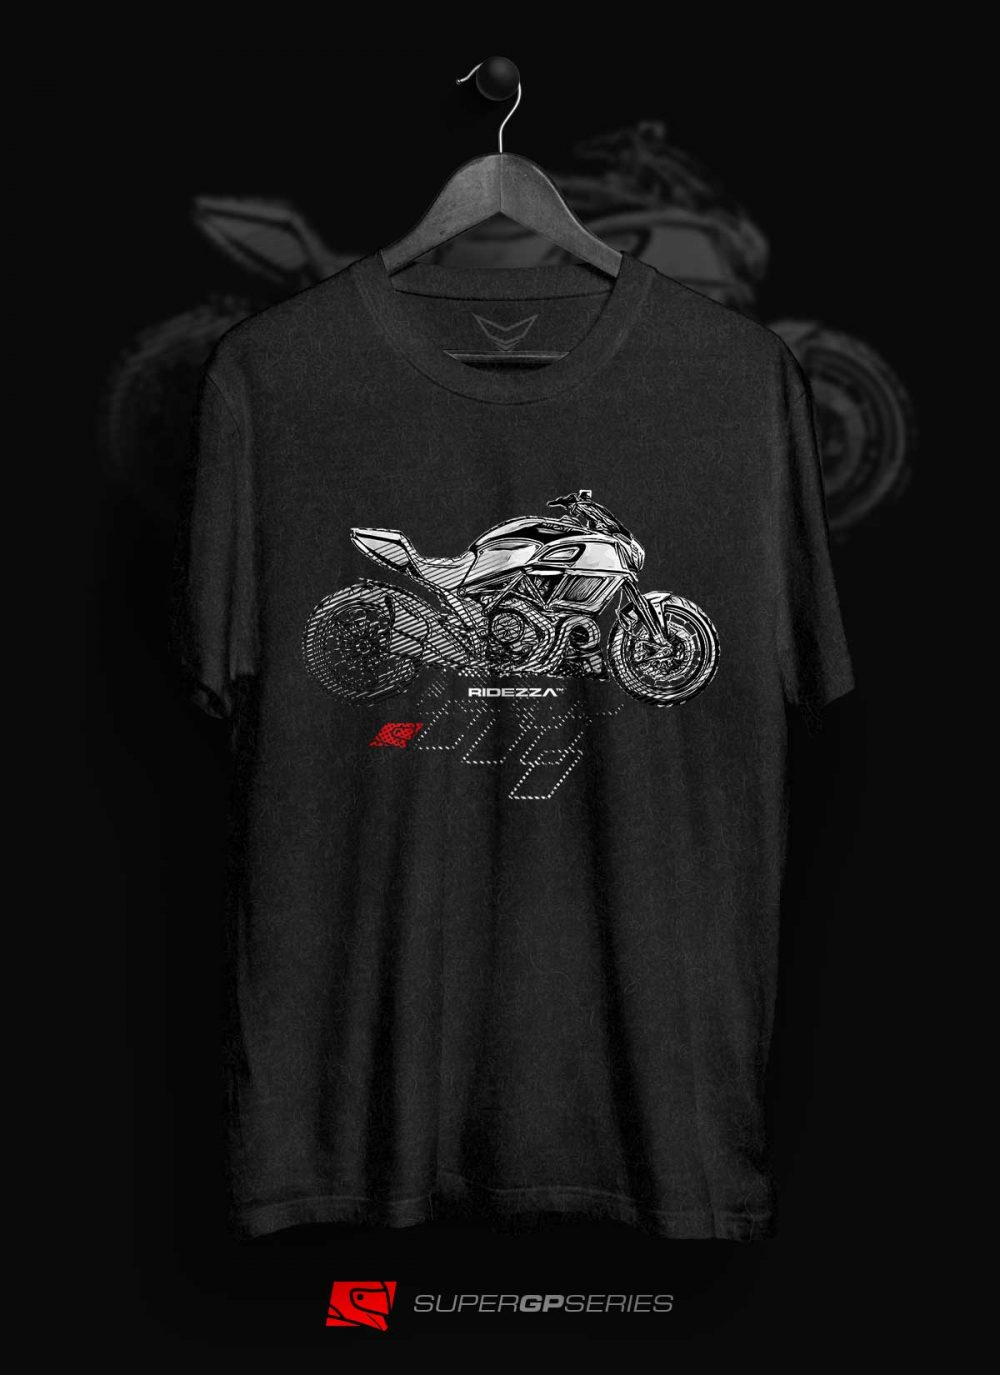 Ridezza Diavel Gen 2 SuperGP Series T-Shirt